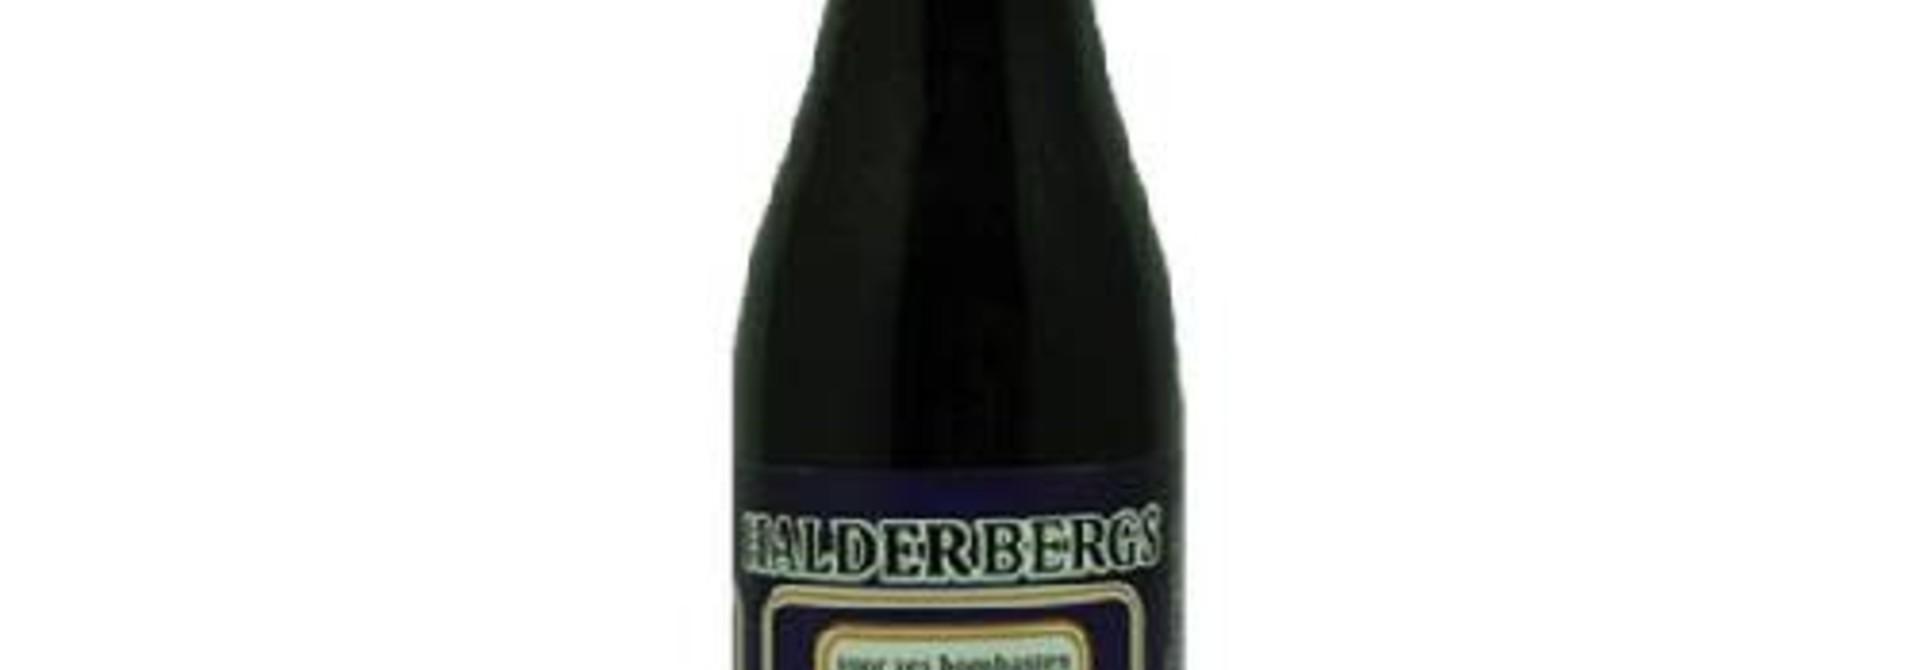 MEULENEIND HALDERBERGS BOMBAST